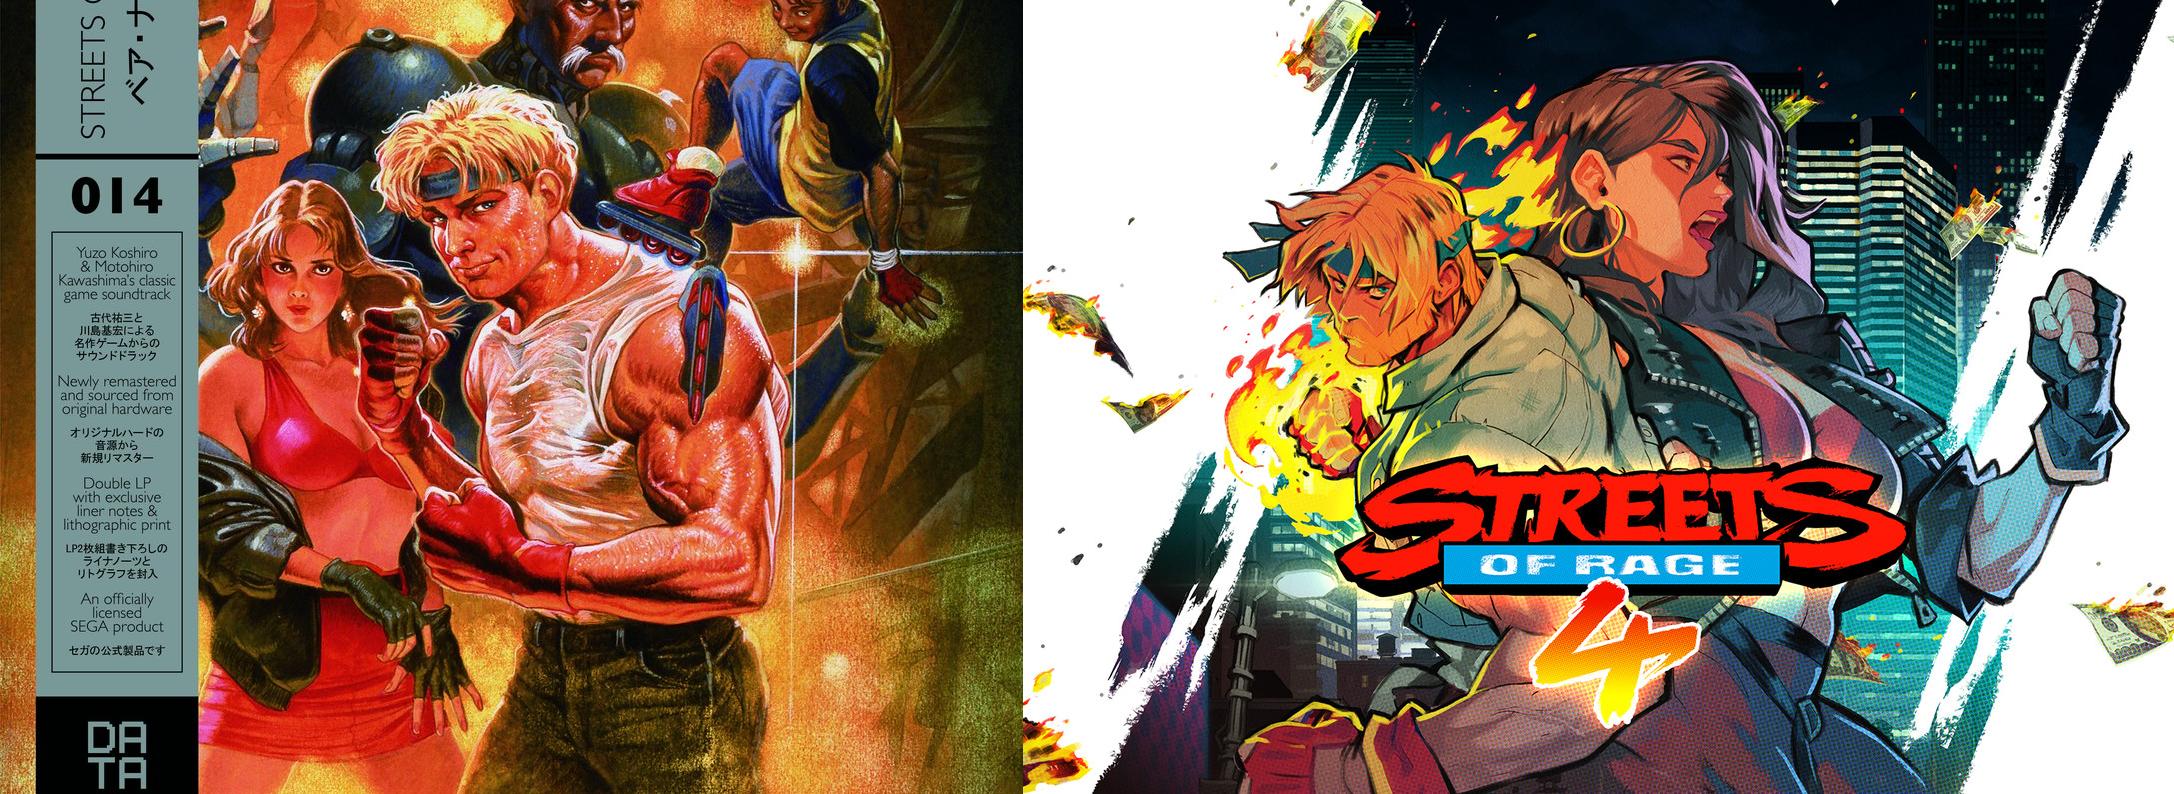 (Image: Streets of Rage 3 vs Streets of Rage 4)